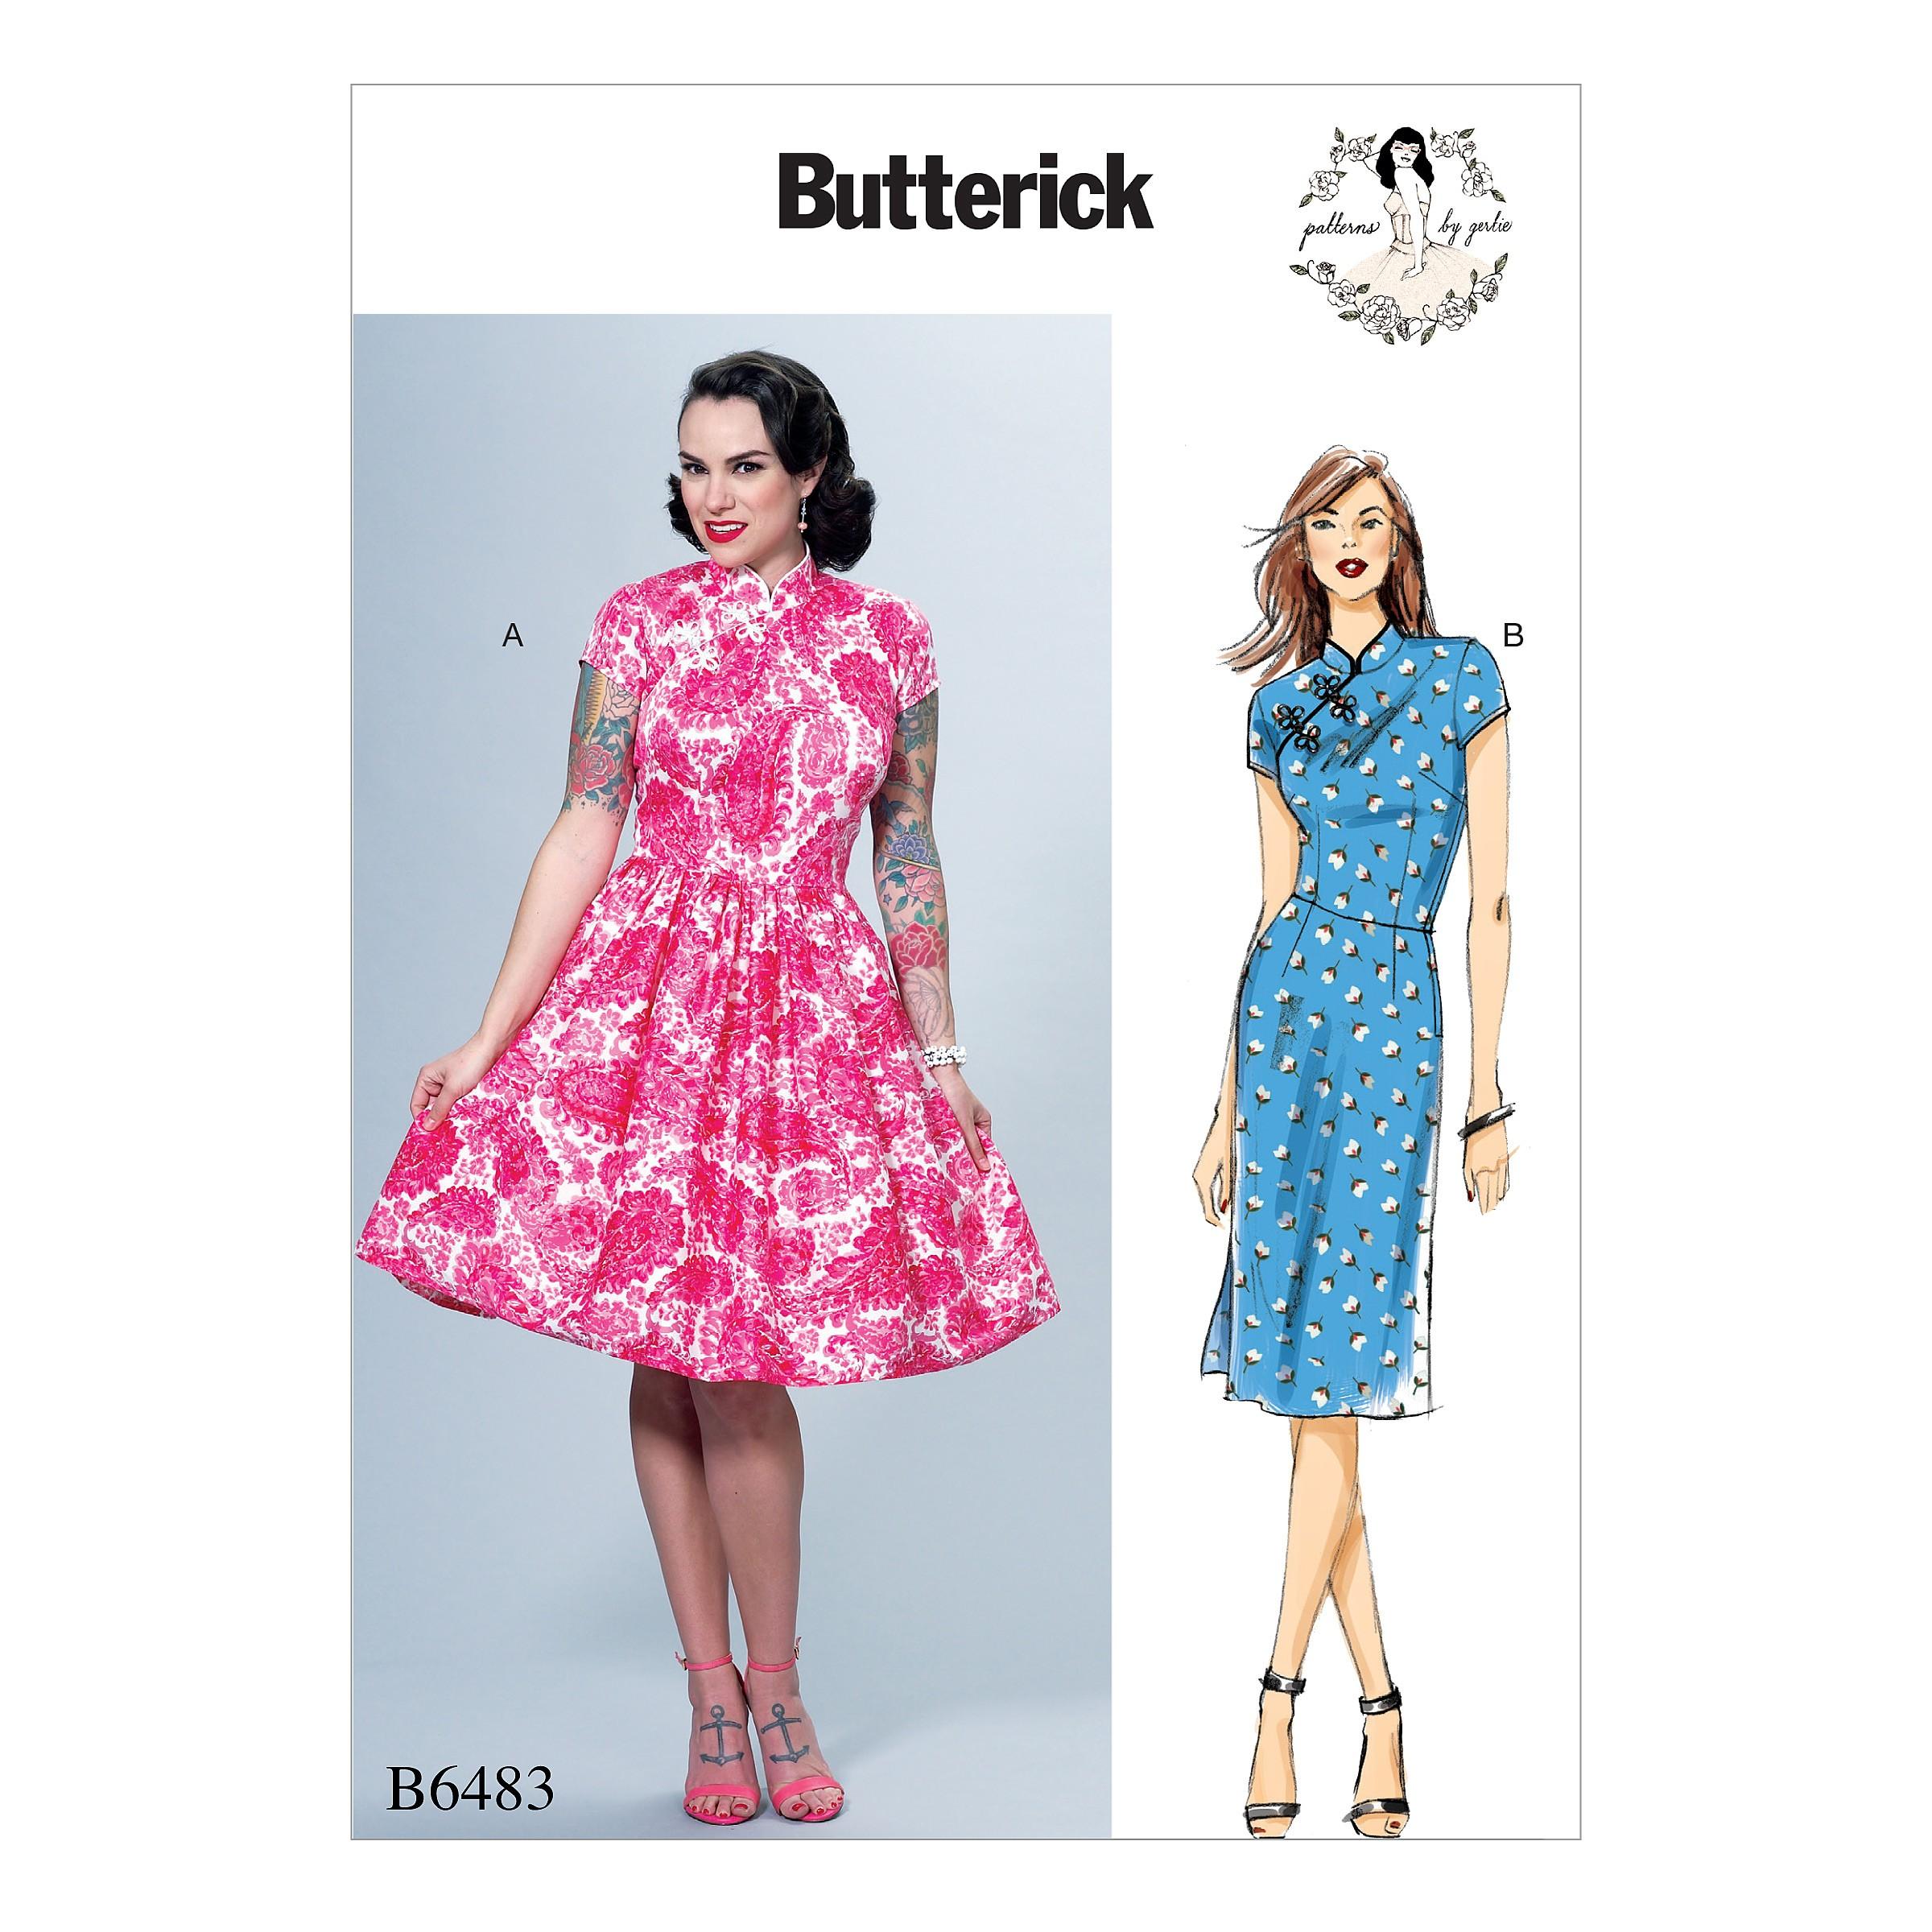 Butterick Sewing Pattern 6483 Misses' Dress with Mandarin Collar & Skirt Options